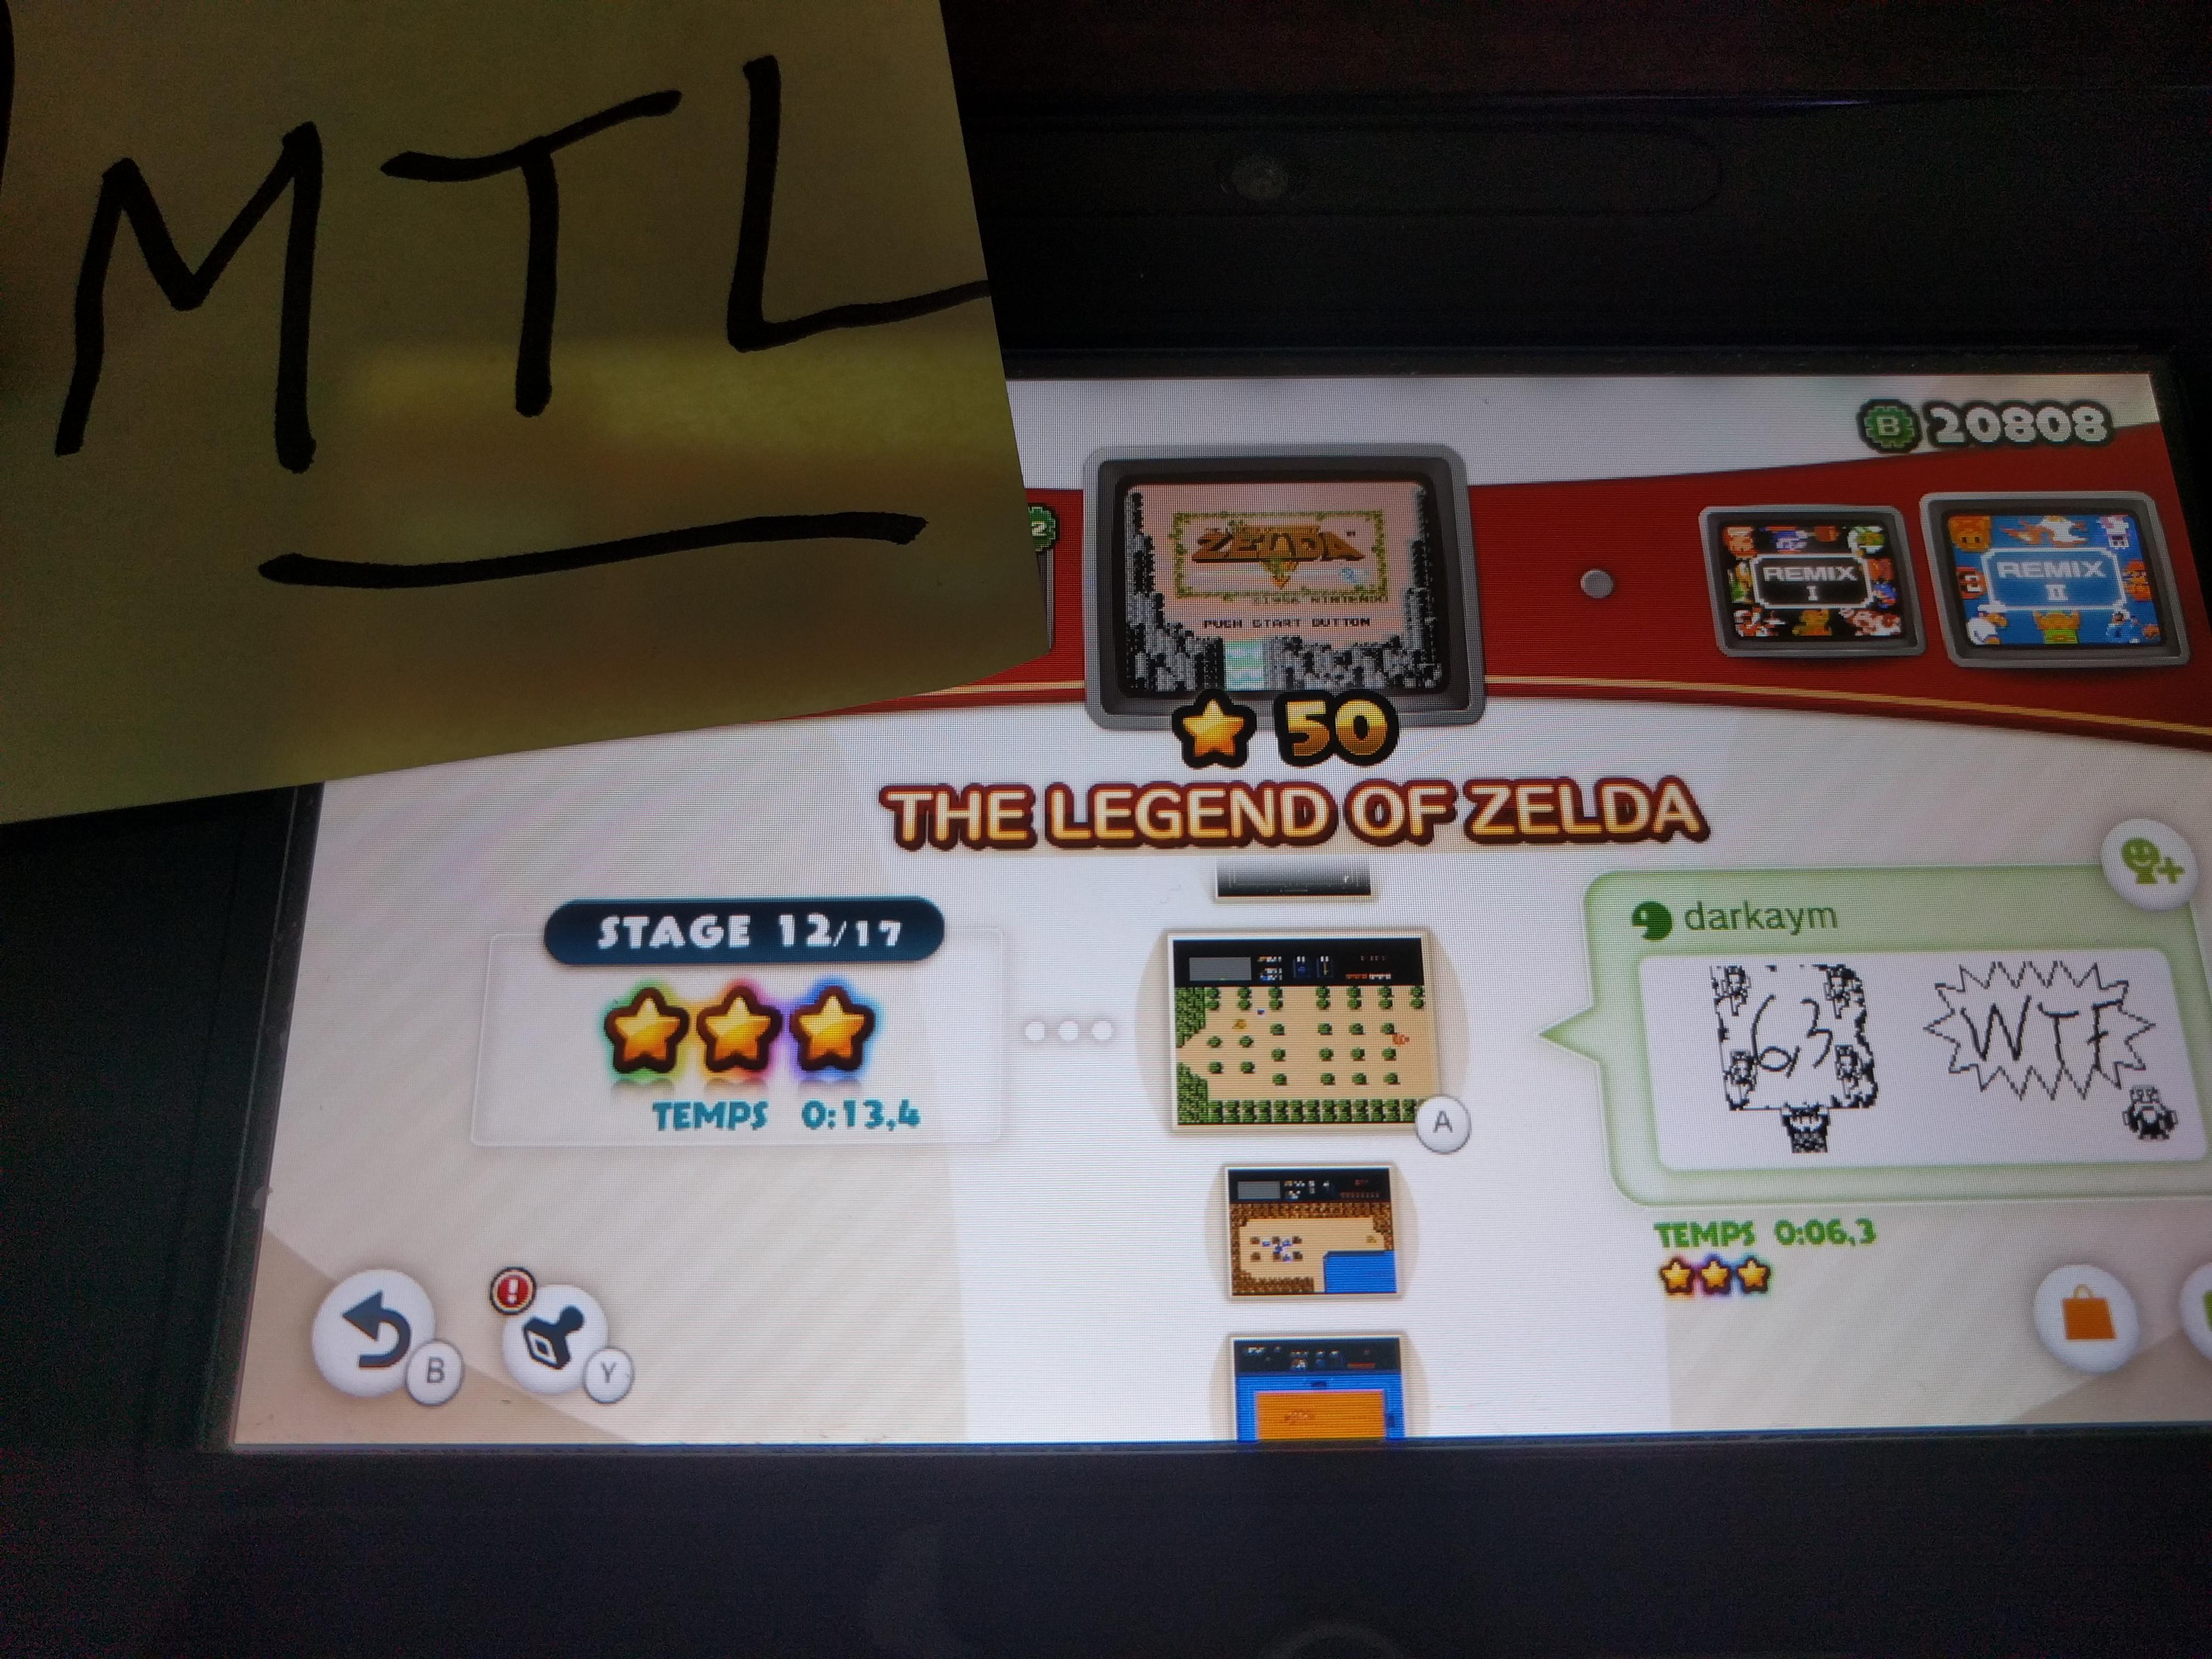 Mantalow: NES Remix: The Legend of Zelda: Stage 12 (Wii U) 0:00:13.4 points on 2016-06-10 19:11:25